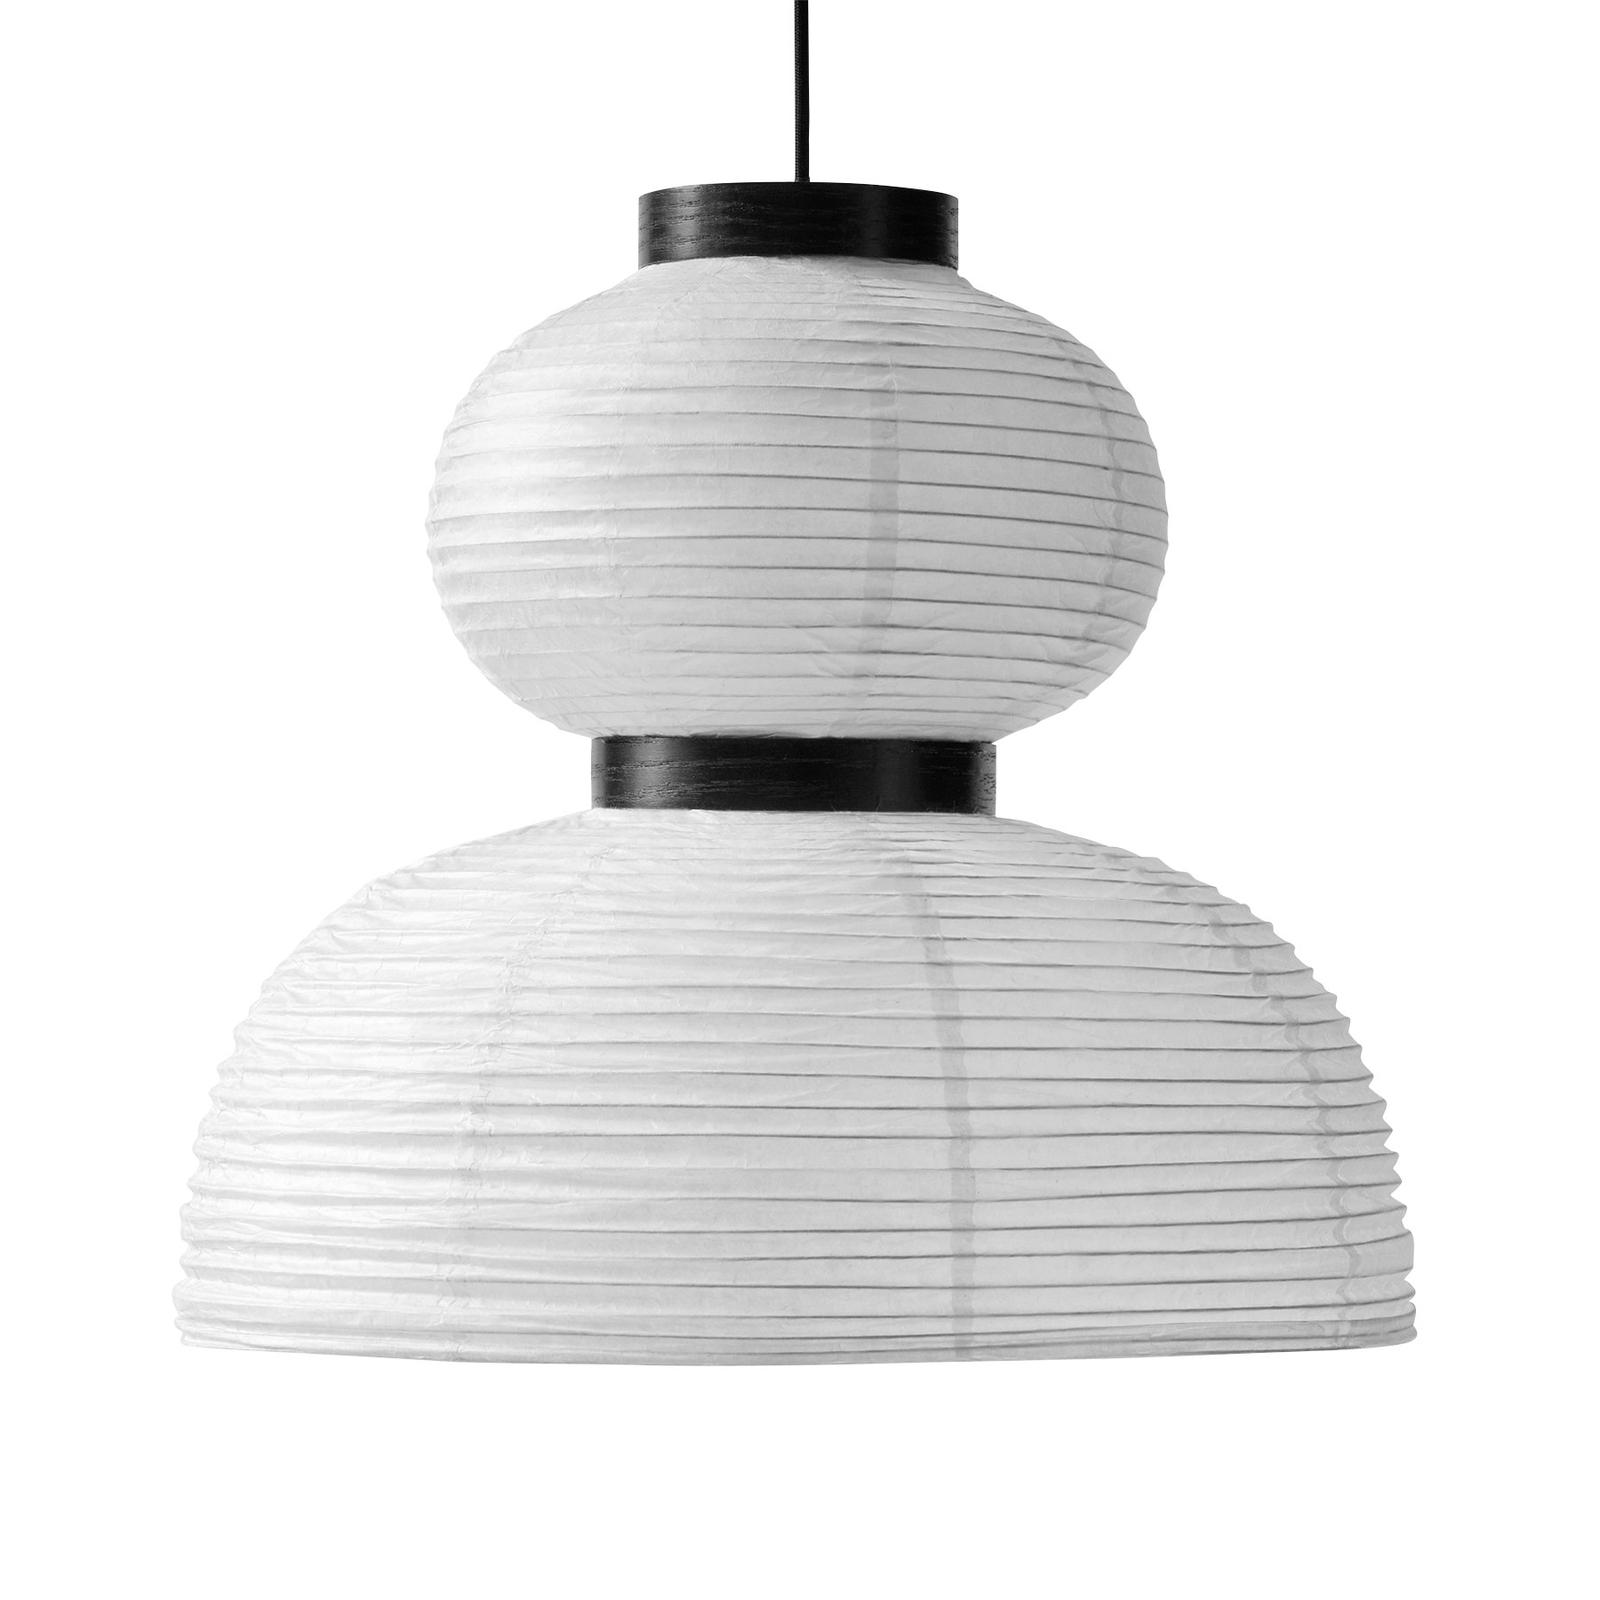 &Tradition Formakami JH4 lampa wisząca